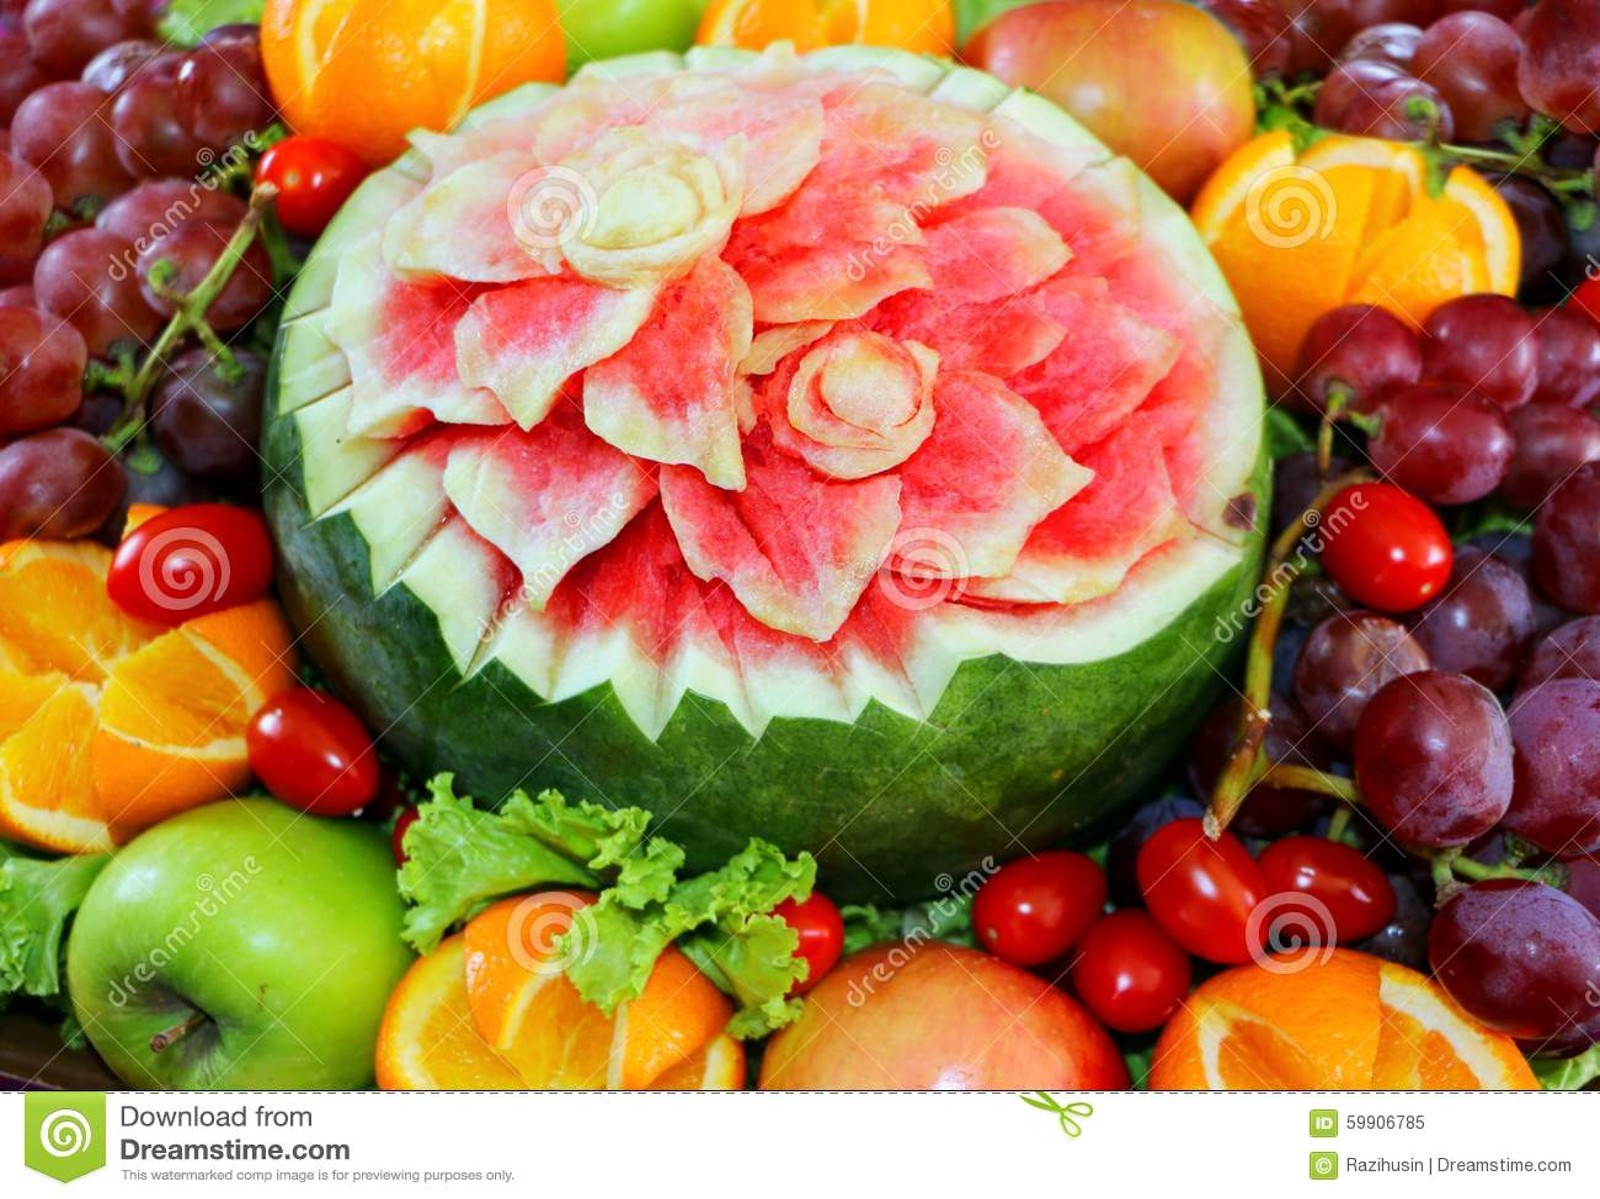 Arbuz Rzeźbiący Kwiatu Kształt Owoc I Obraz Stock Obraz